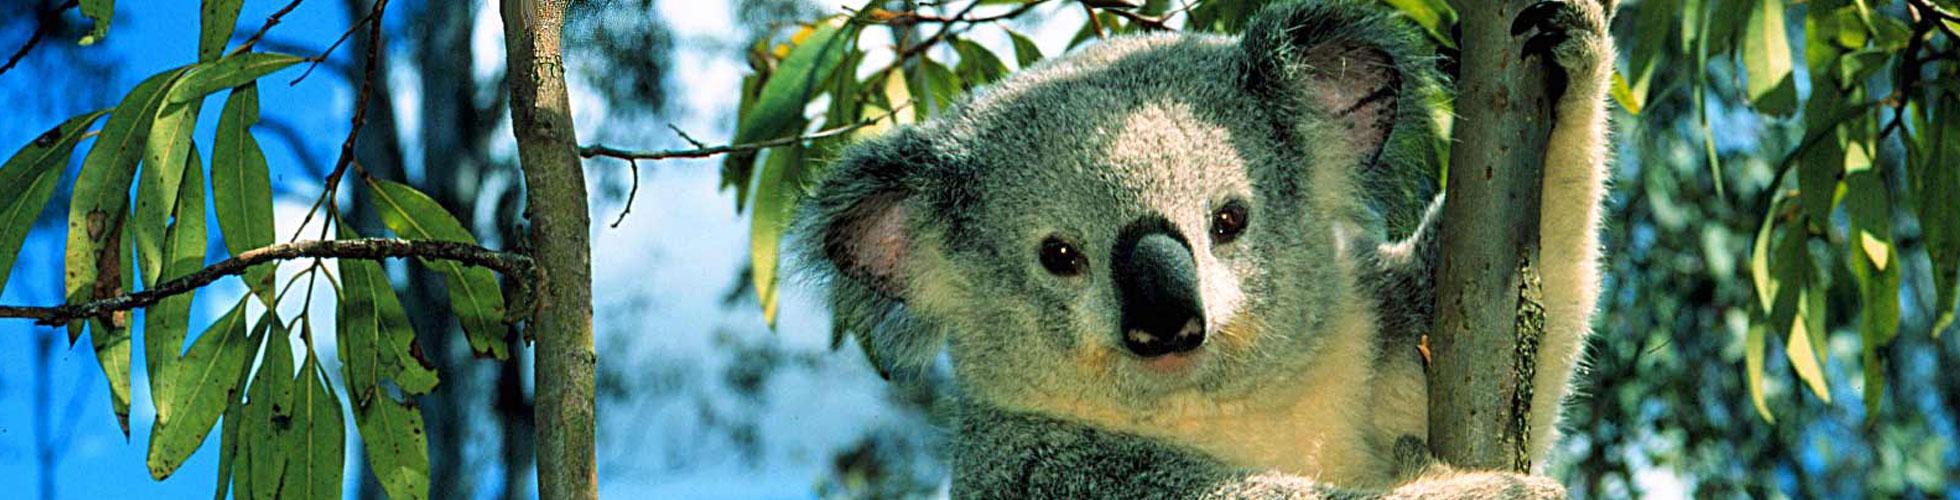 sli-koala